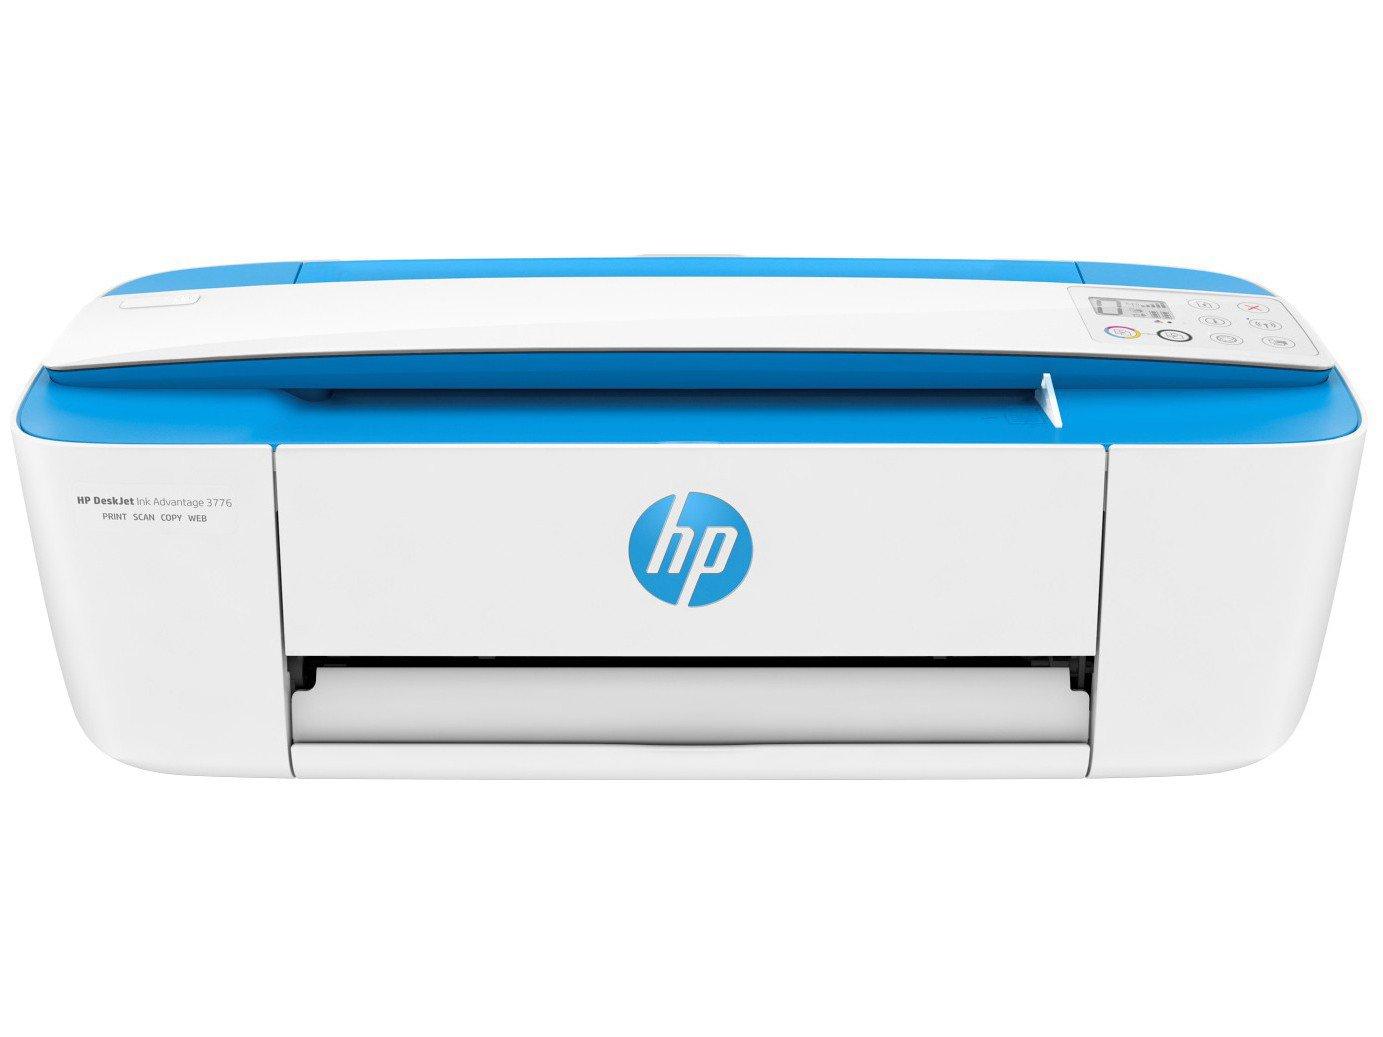 Foto 10 - Multifuncional HP DeskJet Ink Advantage 3776 - Jato de Tinta Display LCD Wi-Fi